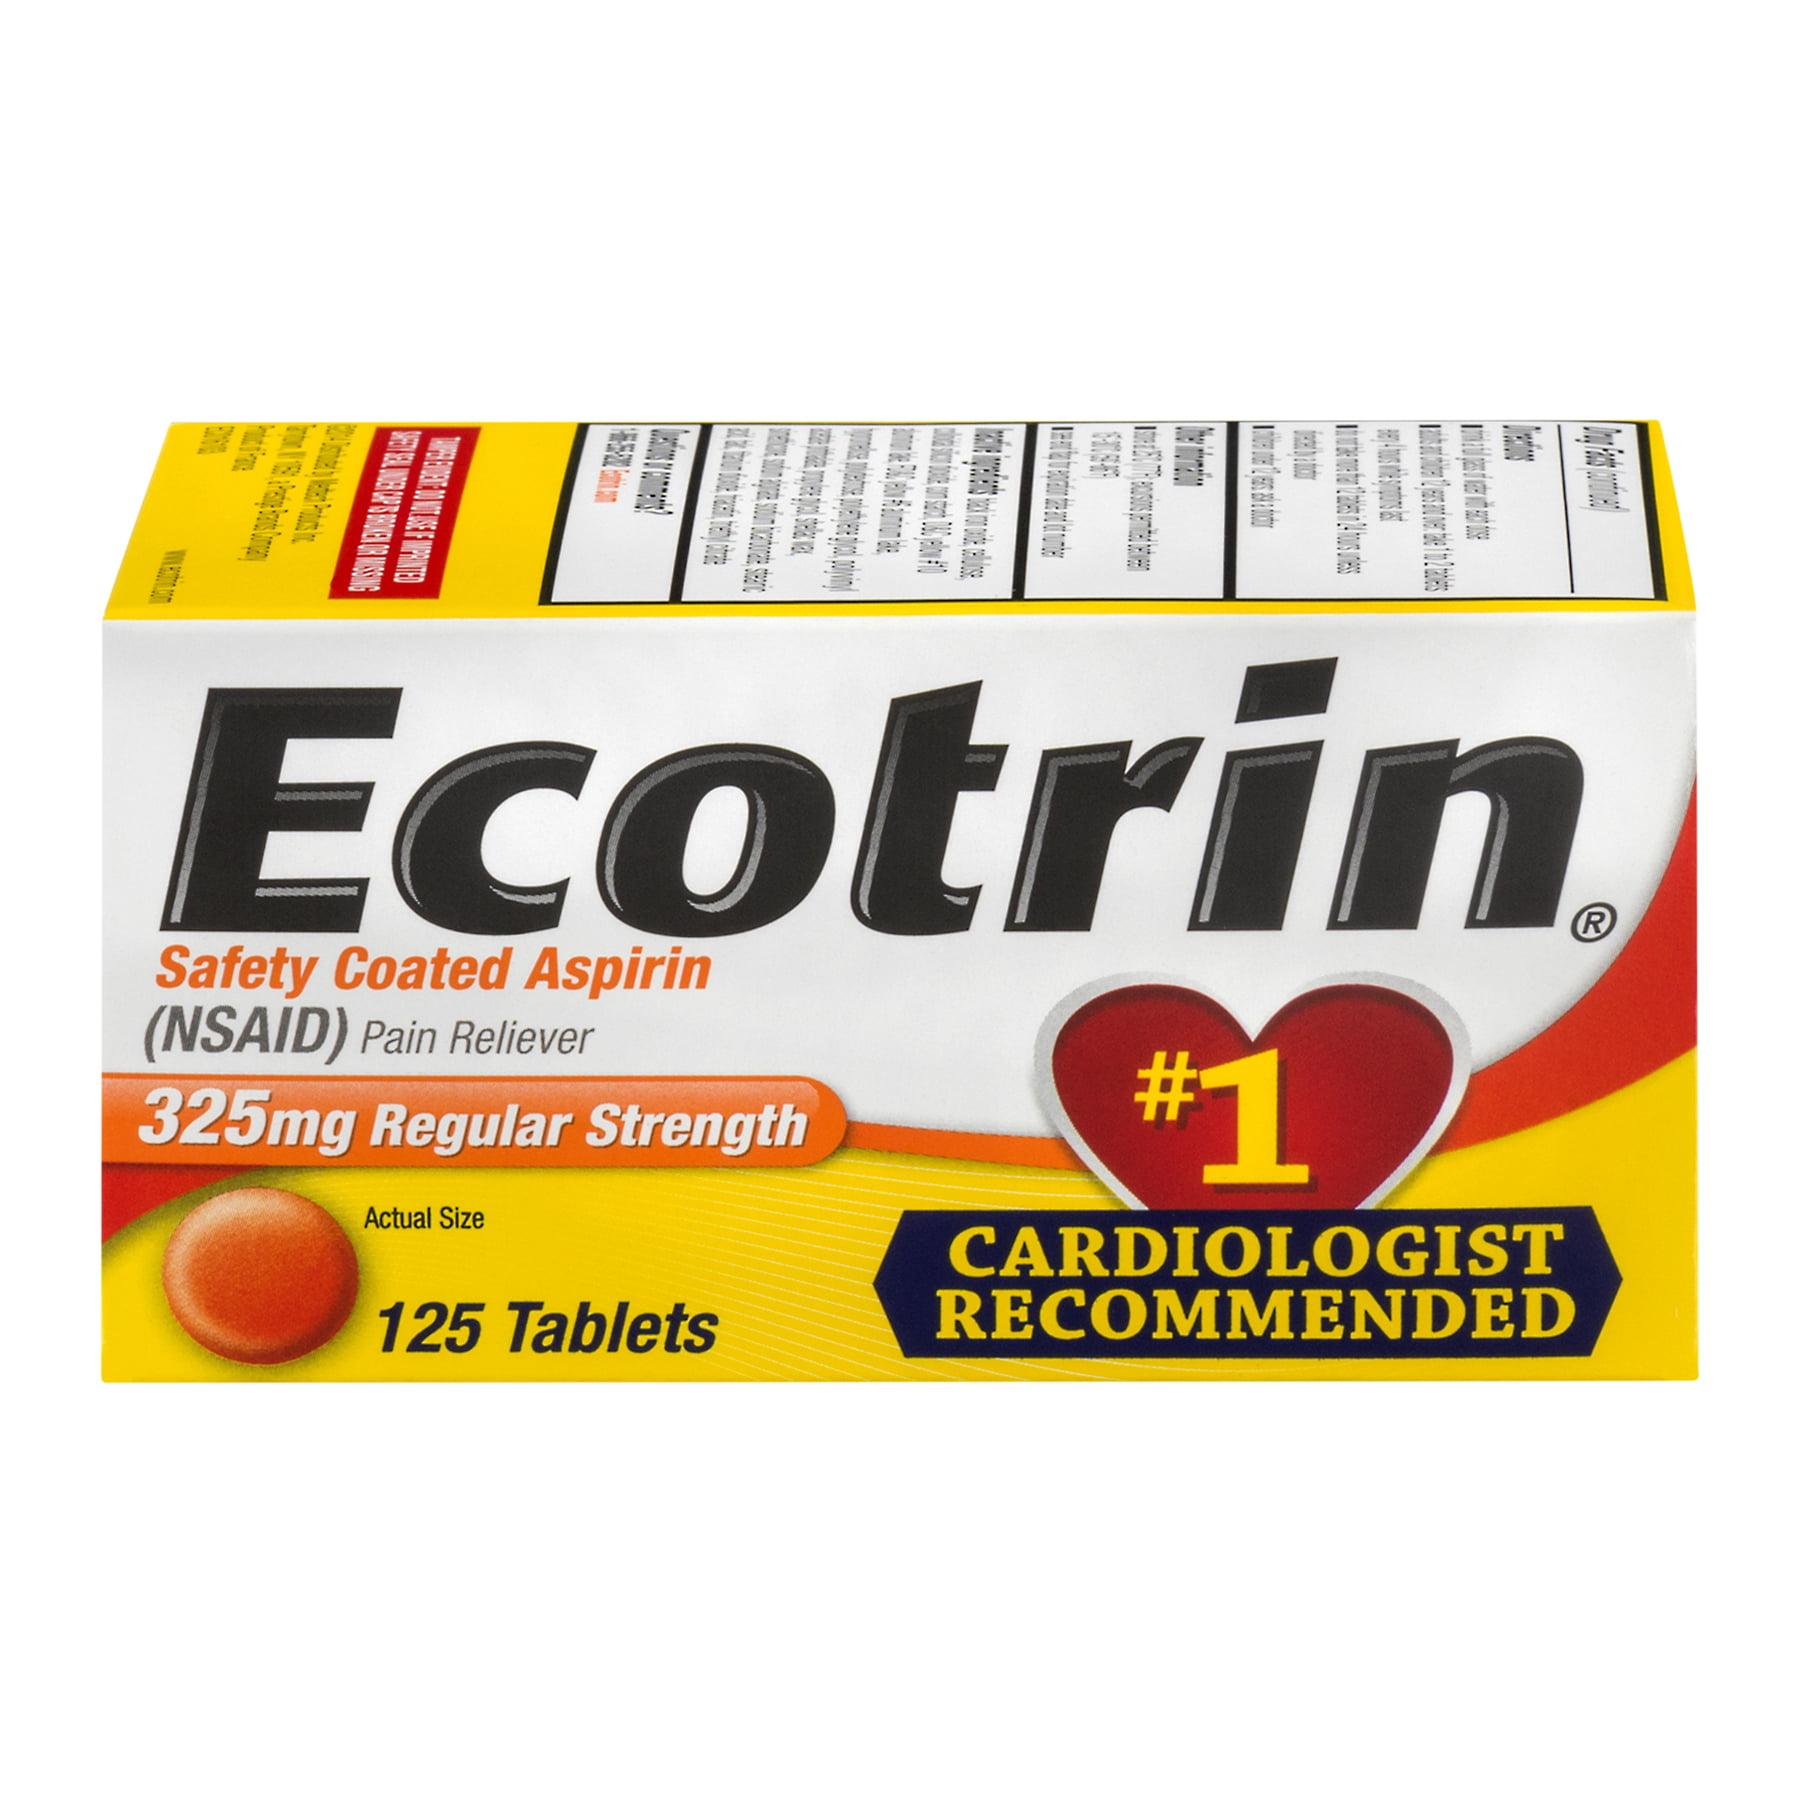 Ecotrin Safety Coated Aspirin Tablets Regular Strength - 125 CT